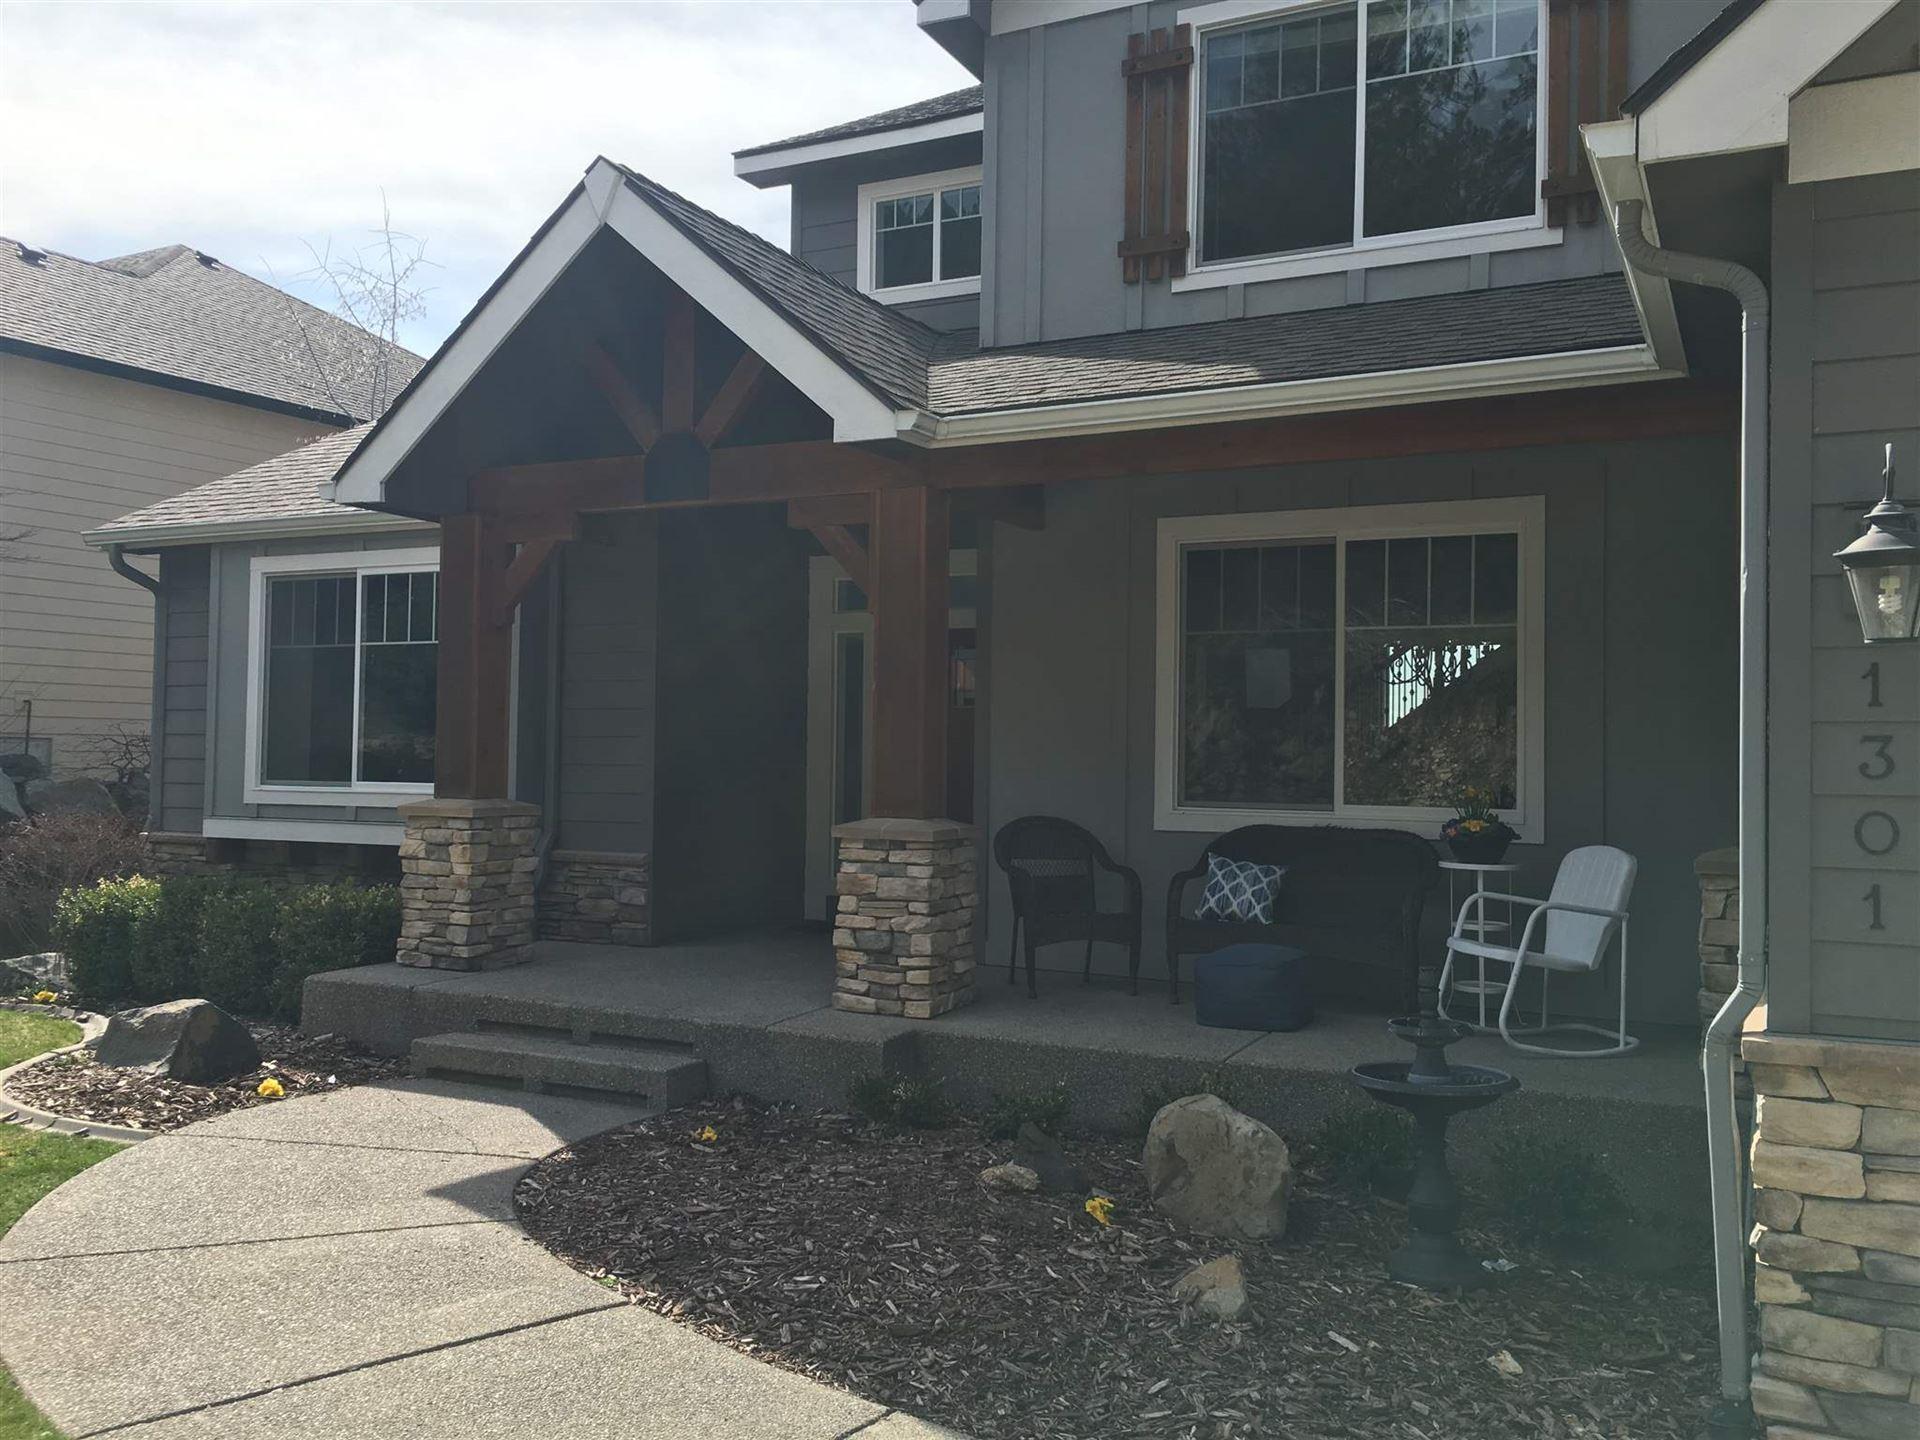 1301 N Dunbarton Oaks Ln, Liberty Lake, WA 99019 - #: 202025804